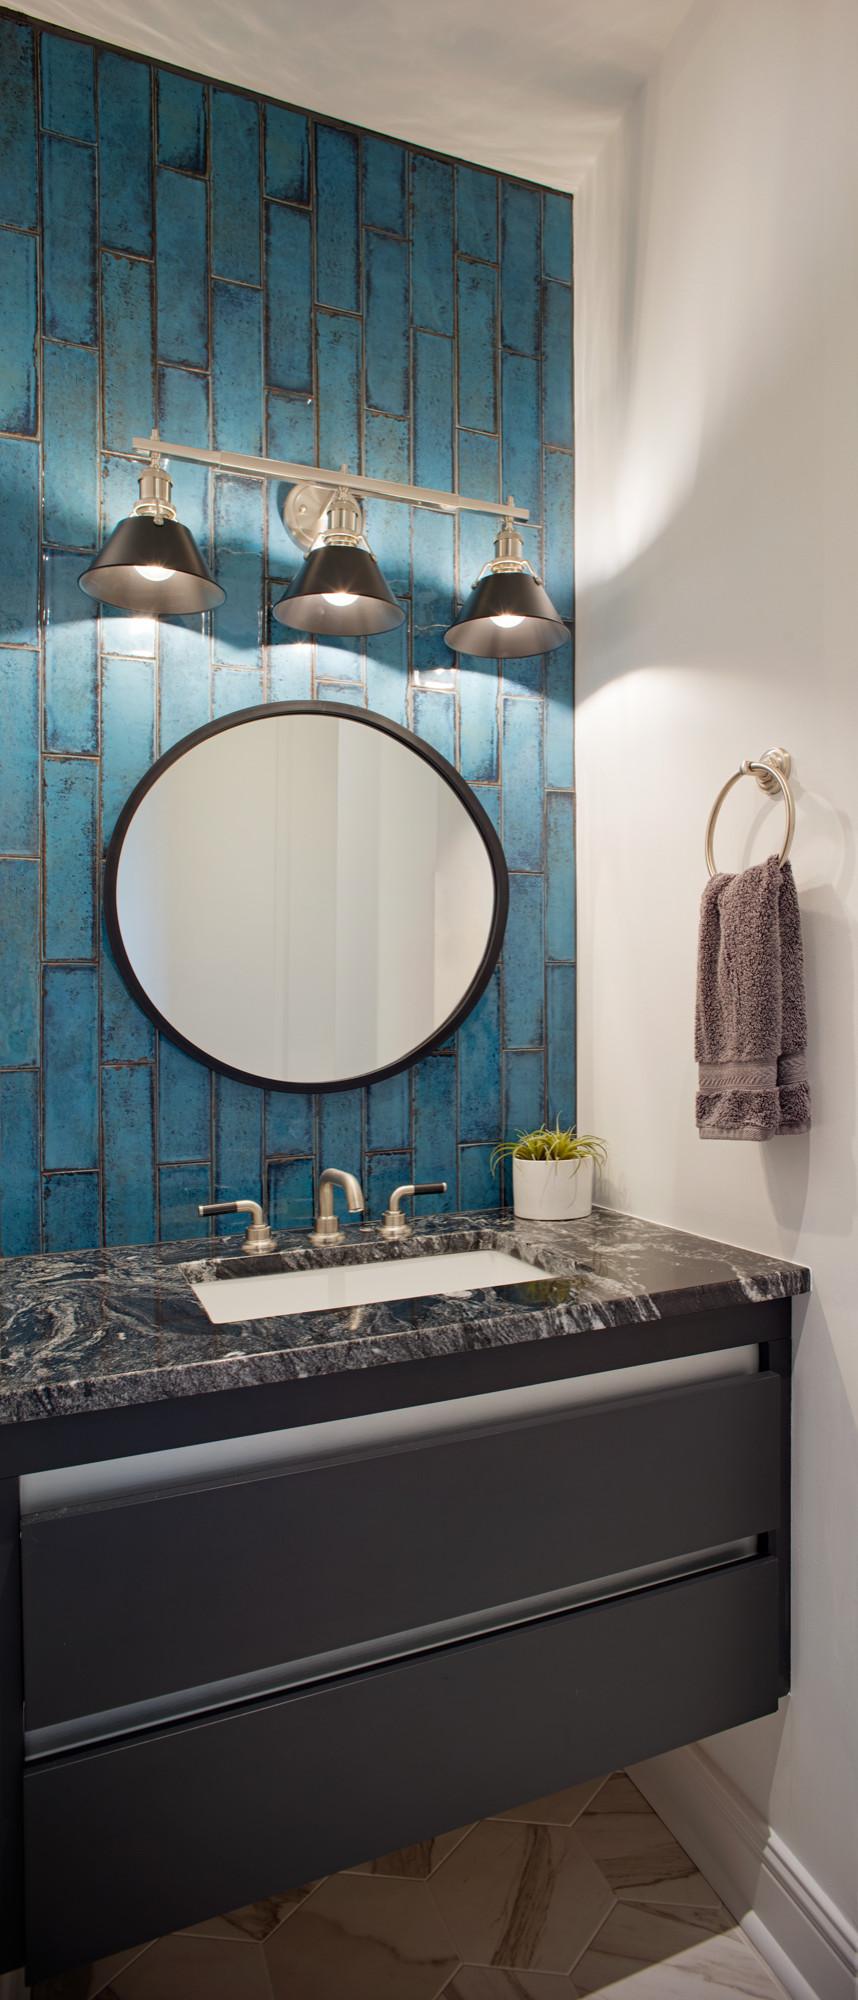 Powder room with dramatic blue tile backsplash